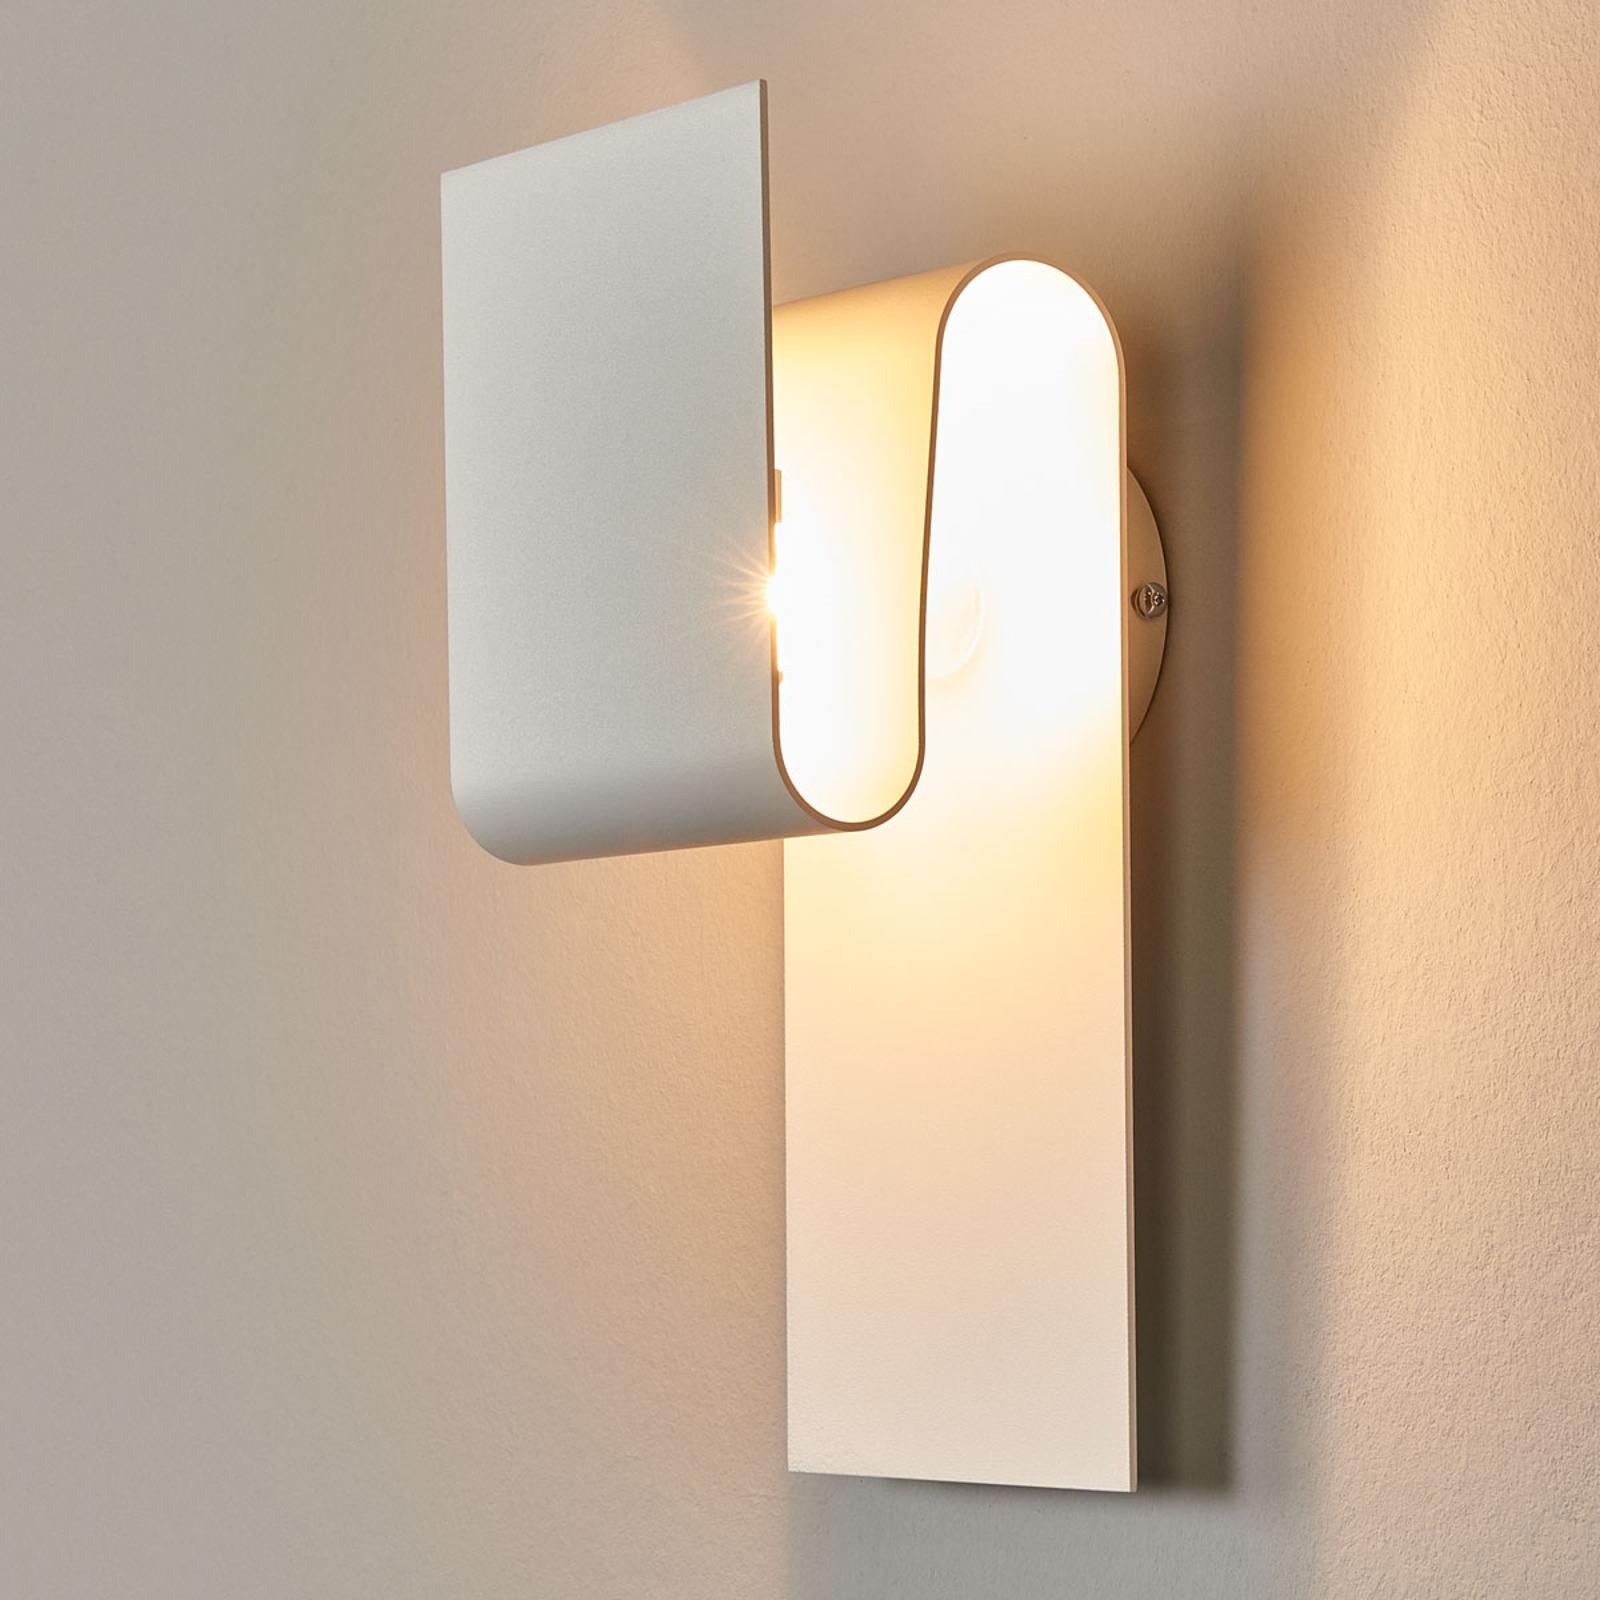 Inspirująca lampa ścienna Fold, matowa biel